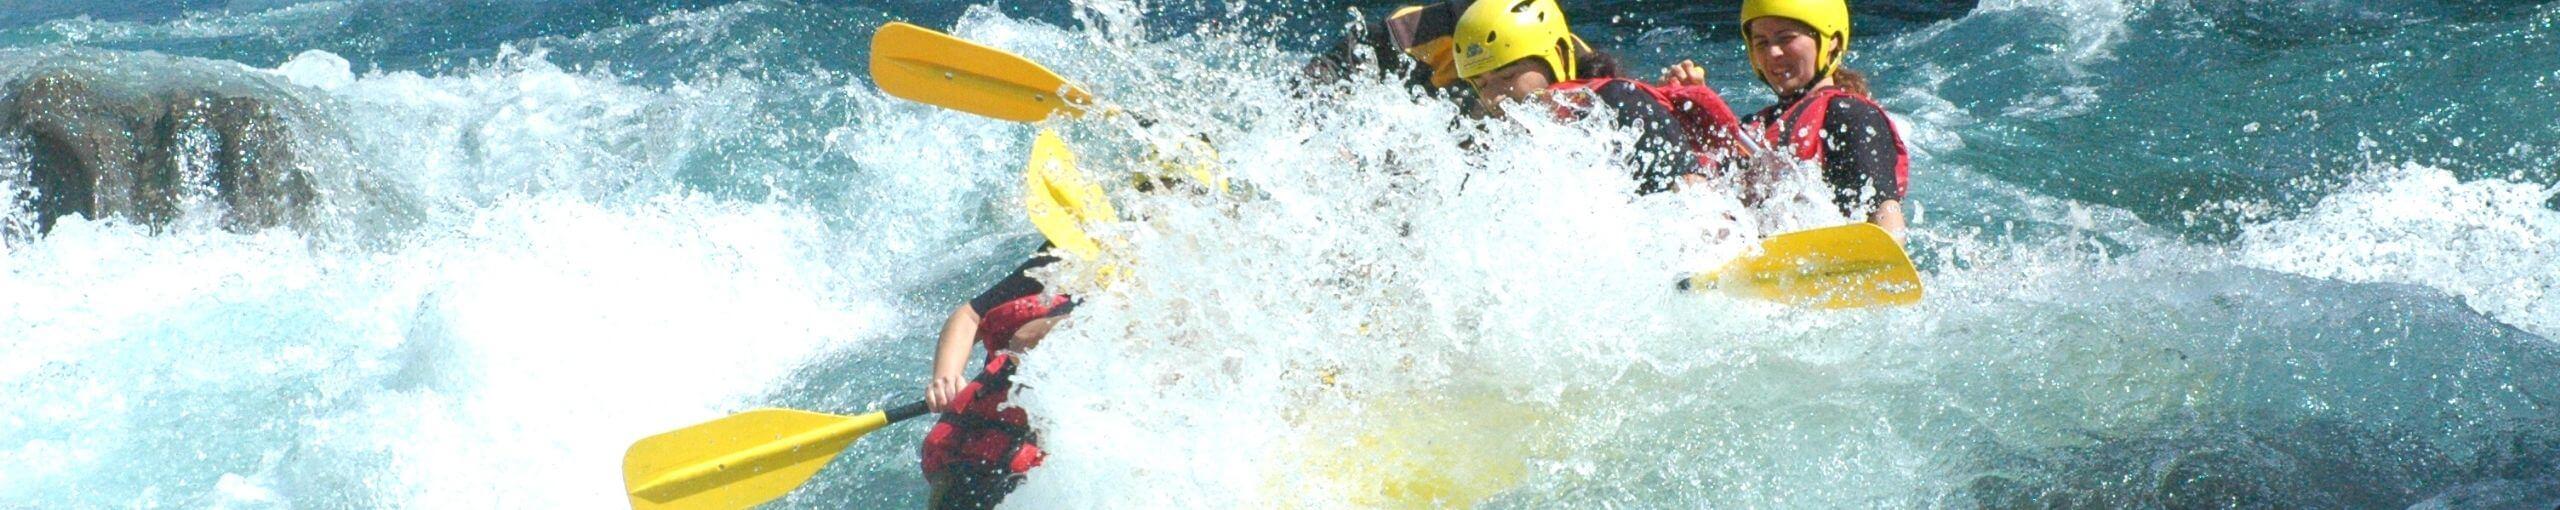 Rafting del Río Ara. Torla, Huesca.